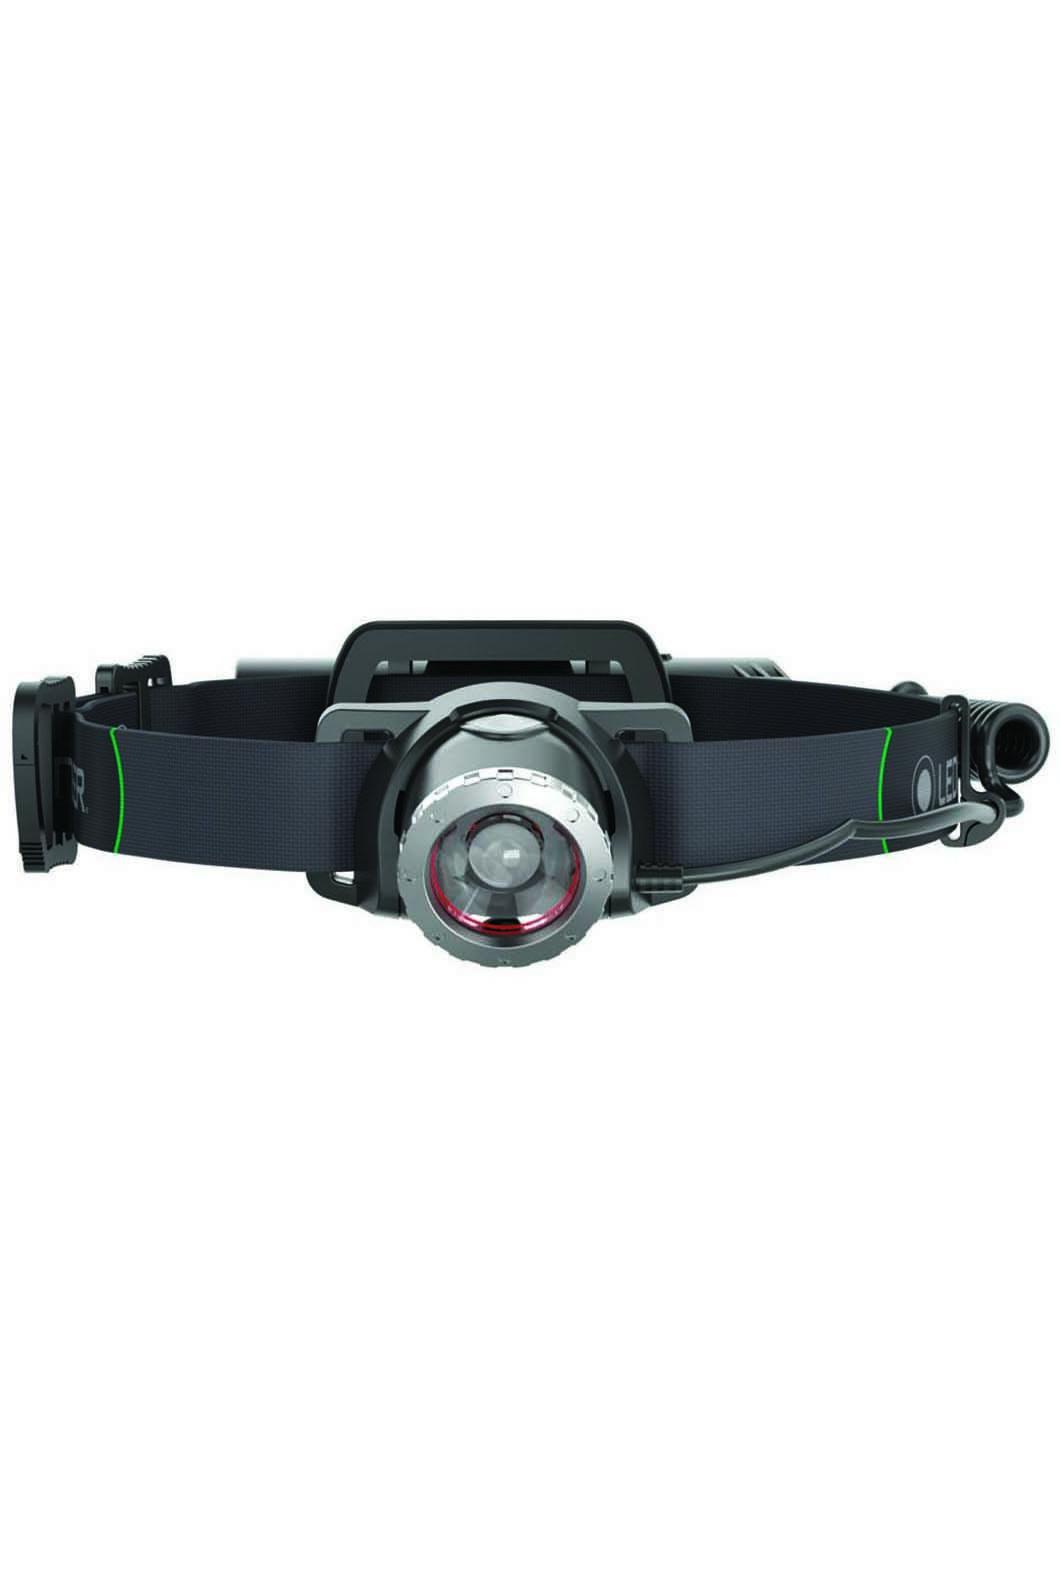 Led Lenser Outdoor Series MH10 Headlamp, None, hi-res